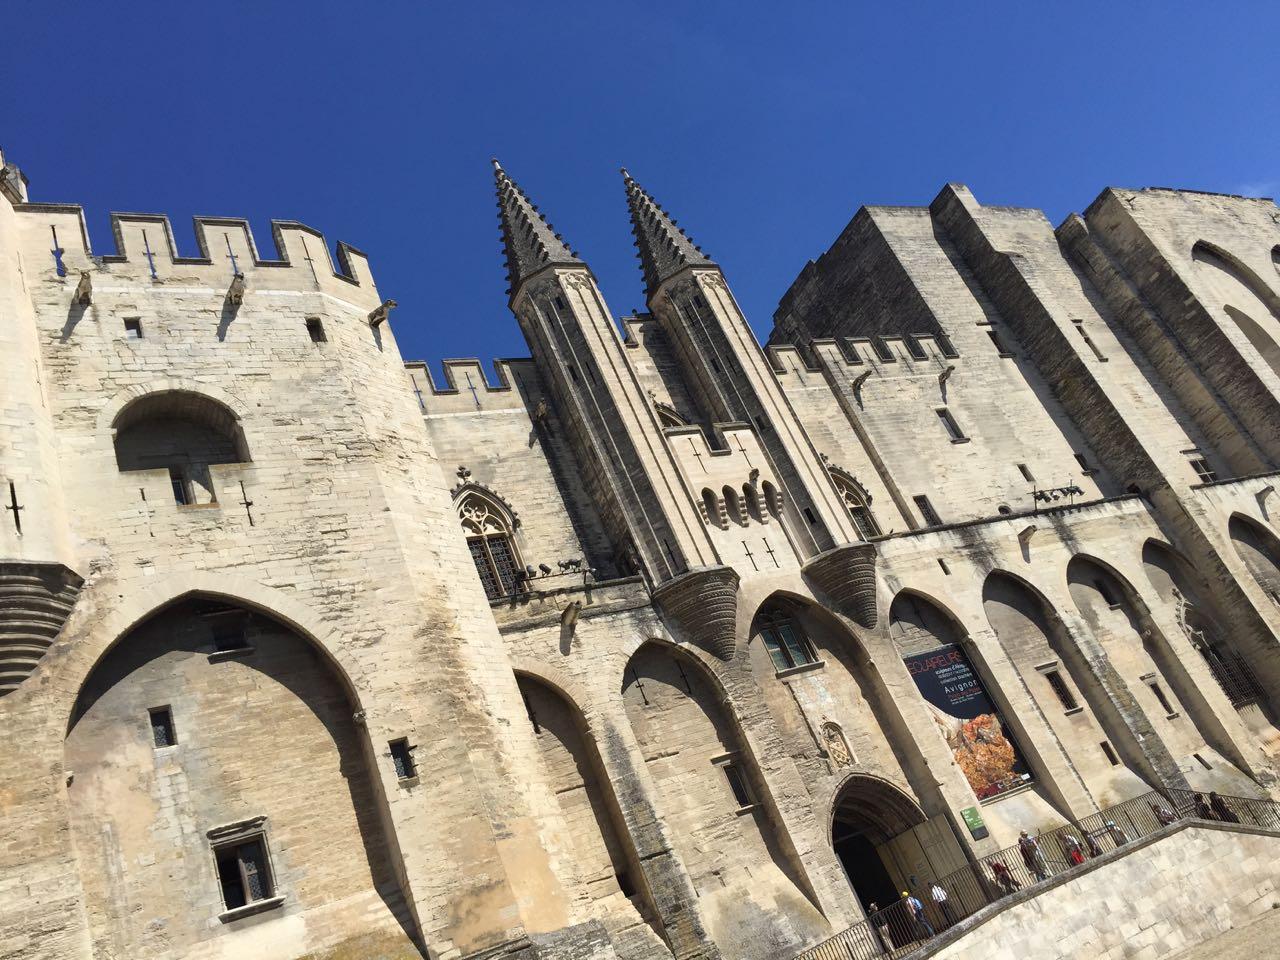 Avignon, the Popes Palace and the festivalA